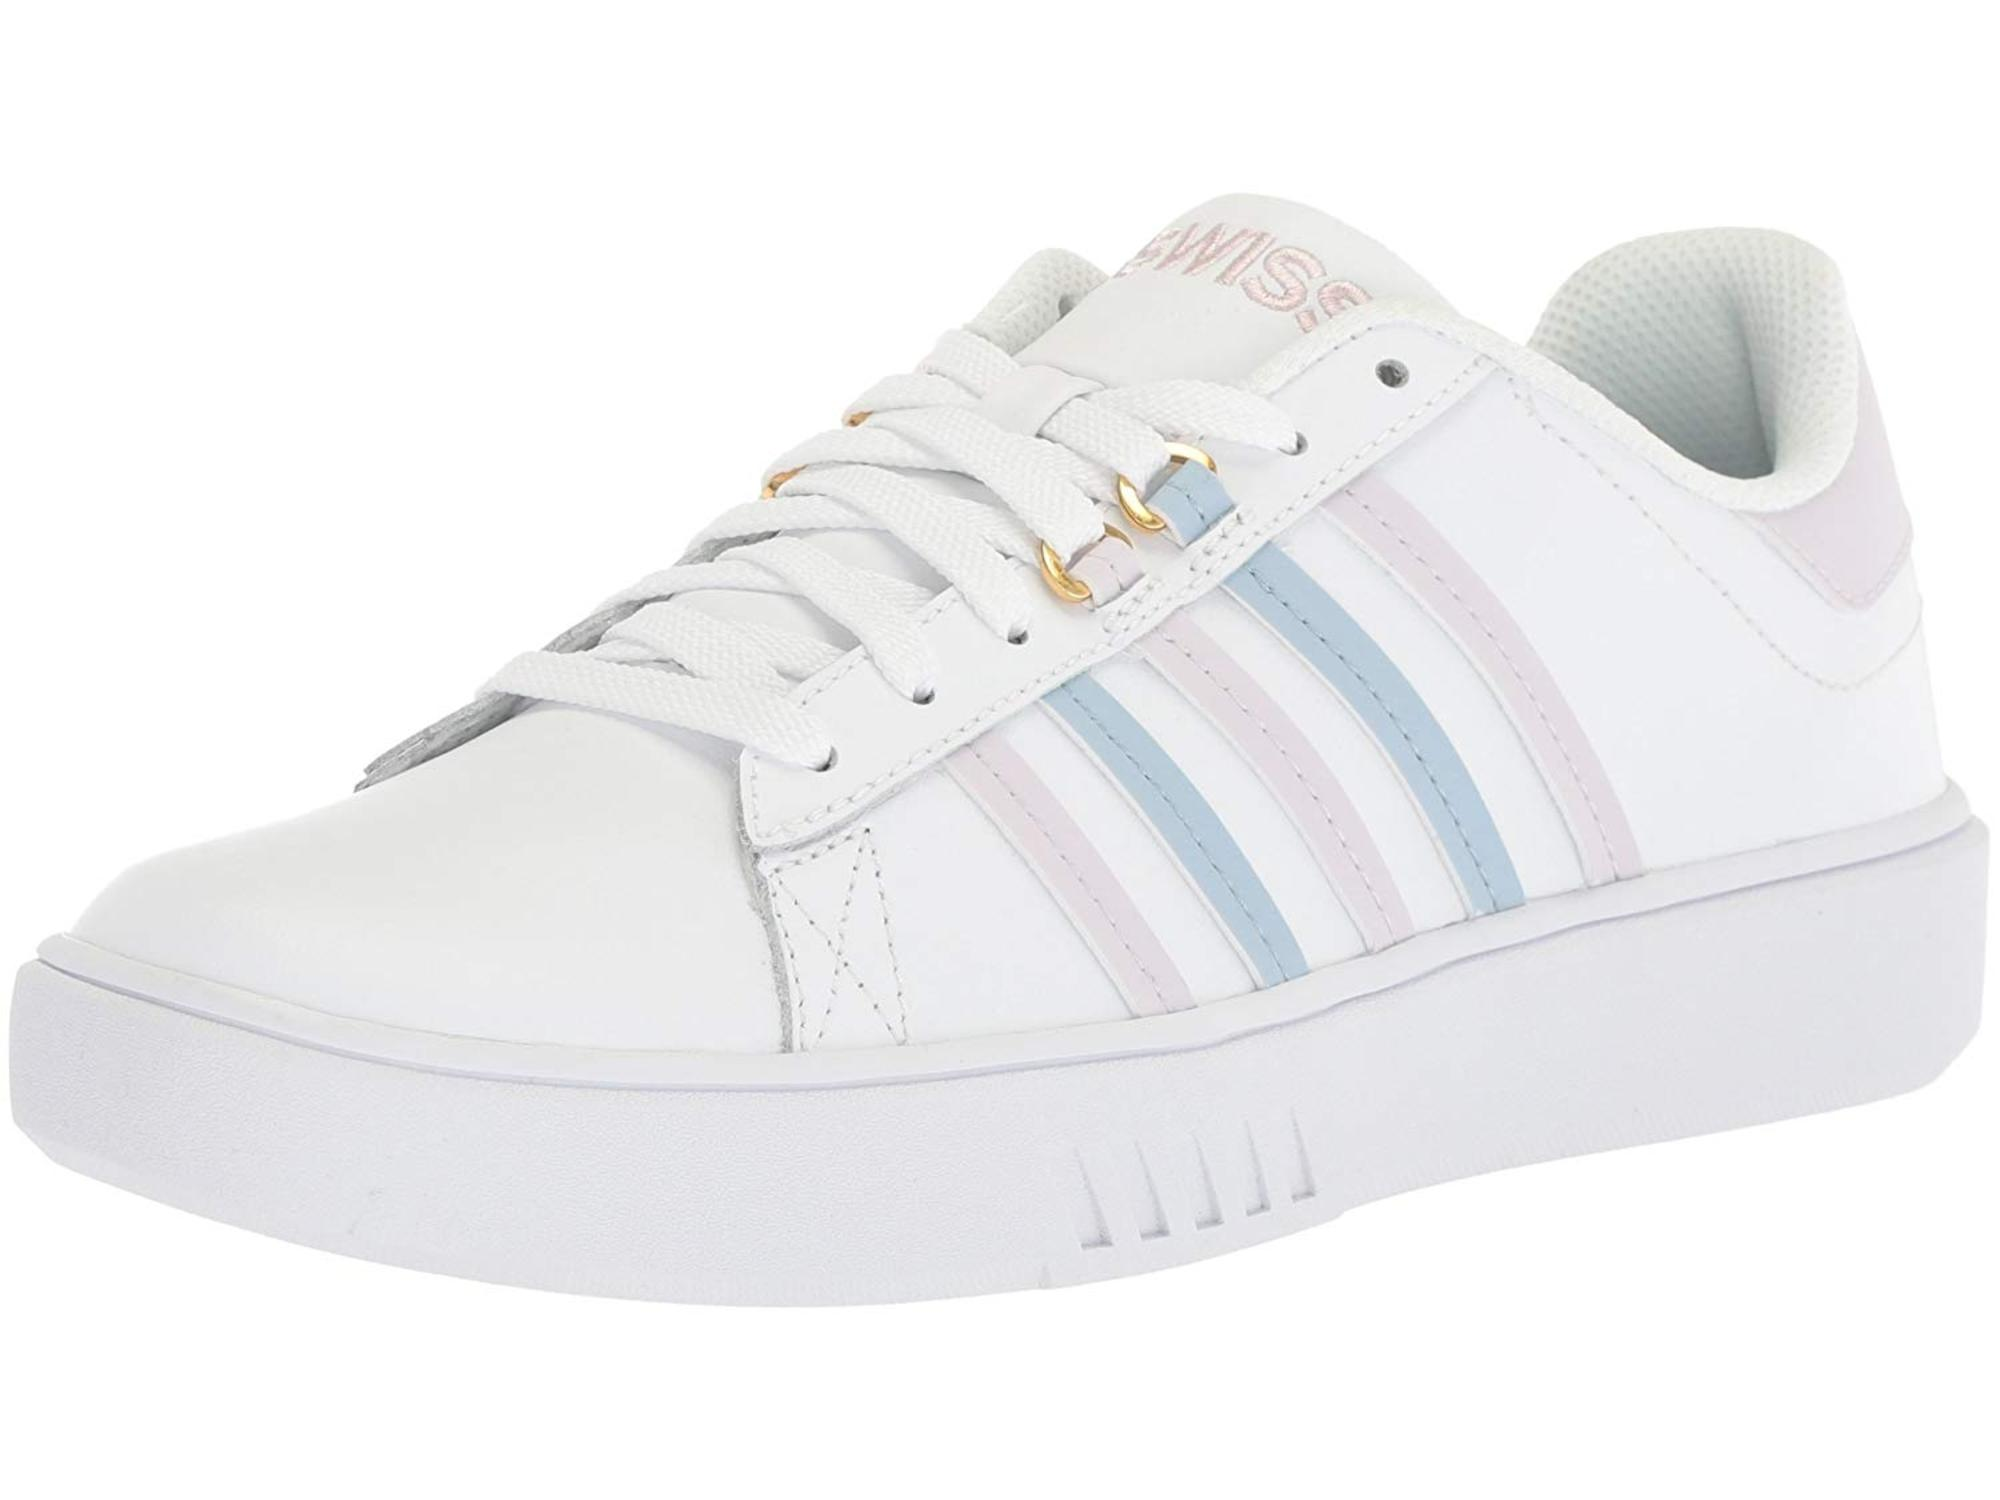 d0a48b0898f68 K-Swiss Women's Pershing Court CMF Sneaker, White, Size 6.0